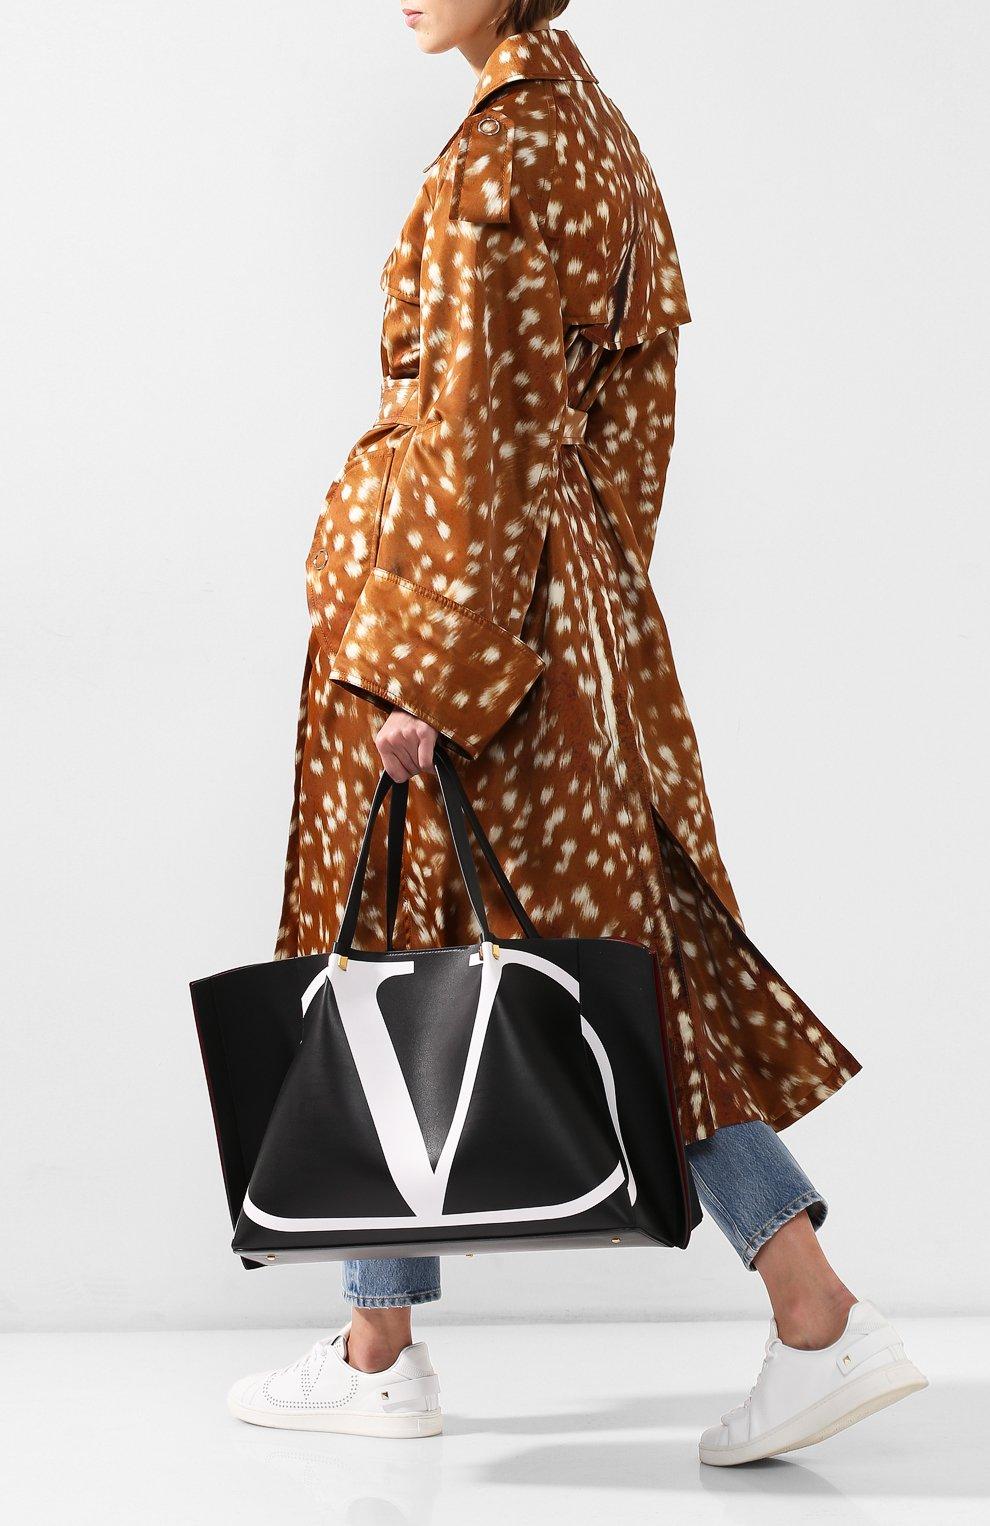 Сумка-тоут Valentino Garavani Go Logo Escape large Valentino черная цвета | Фото №2